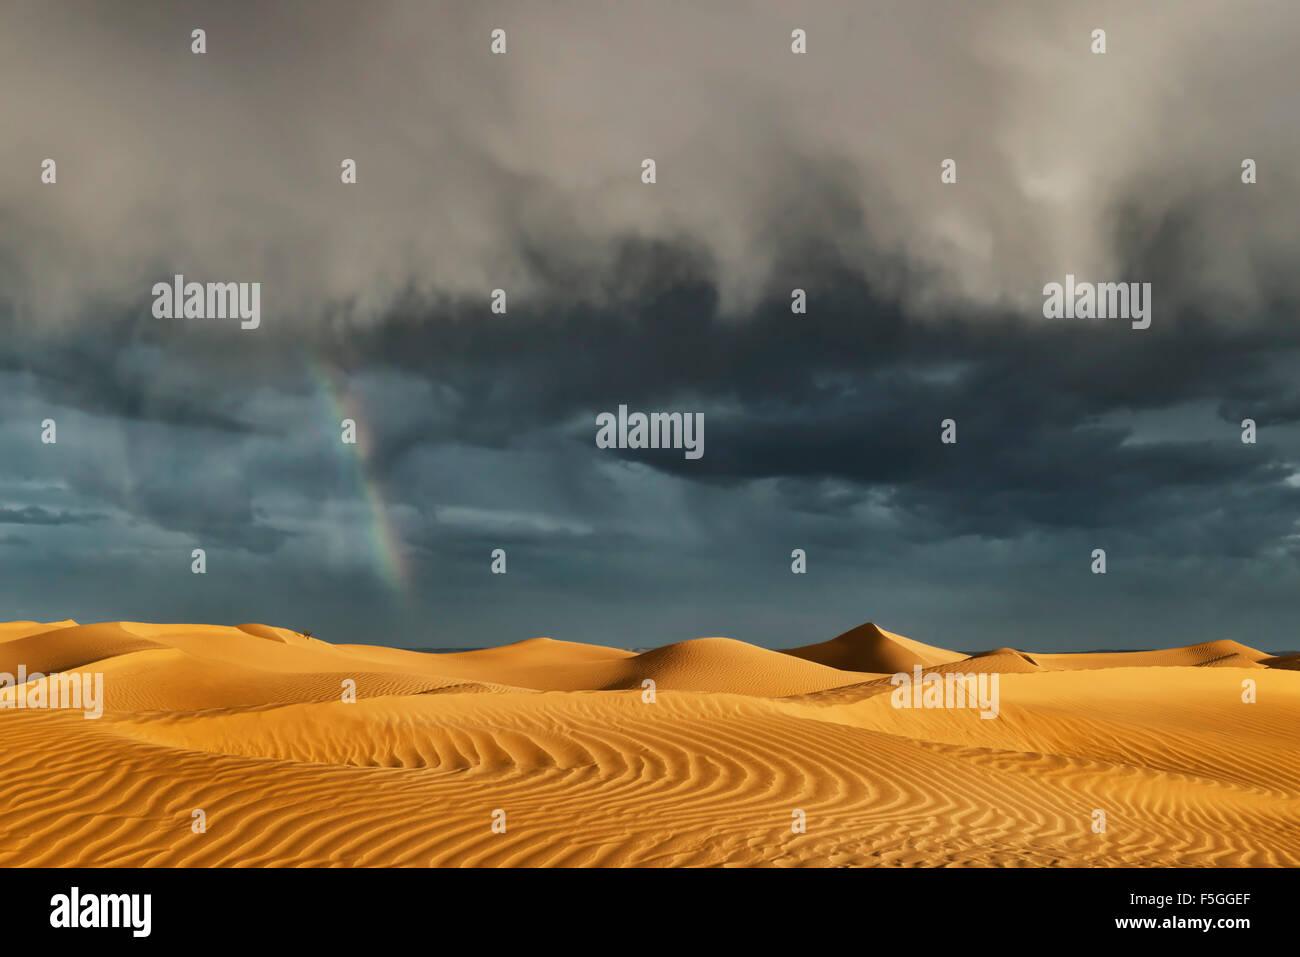 Sahara dune di sabbia con tempestoso, cielo nuvoloso e Rainbow. Immagini Stock